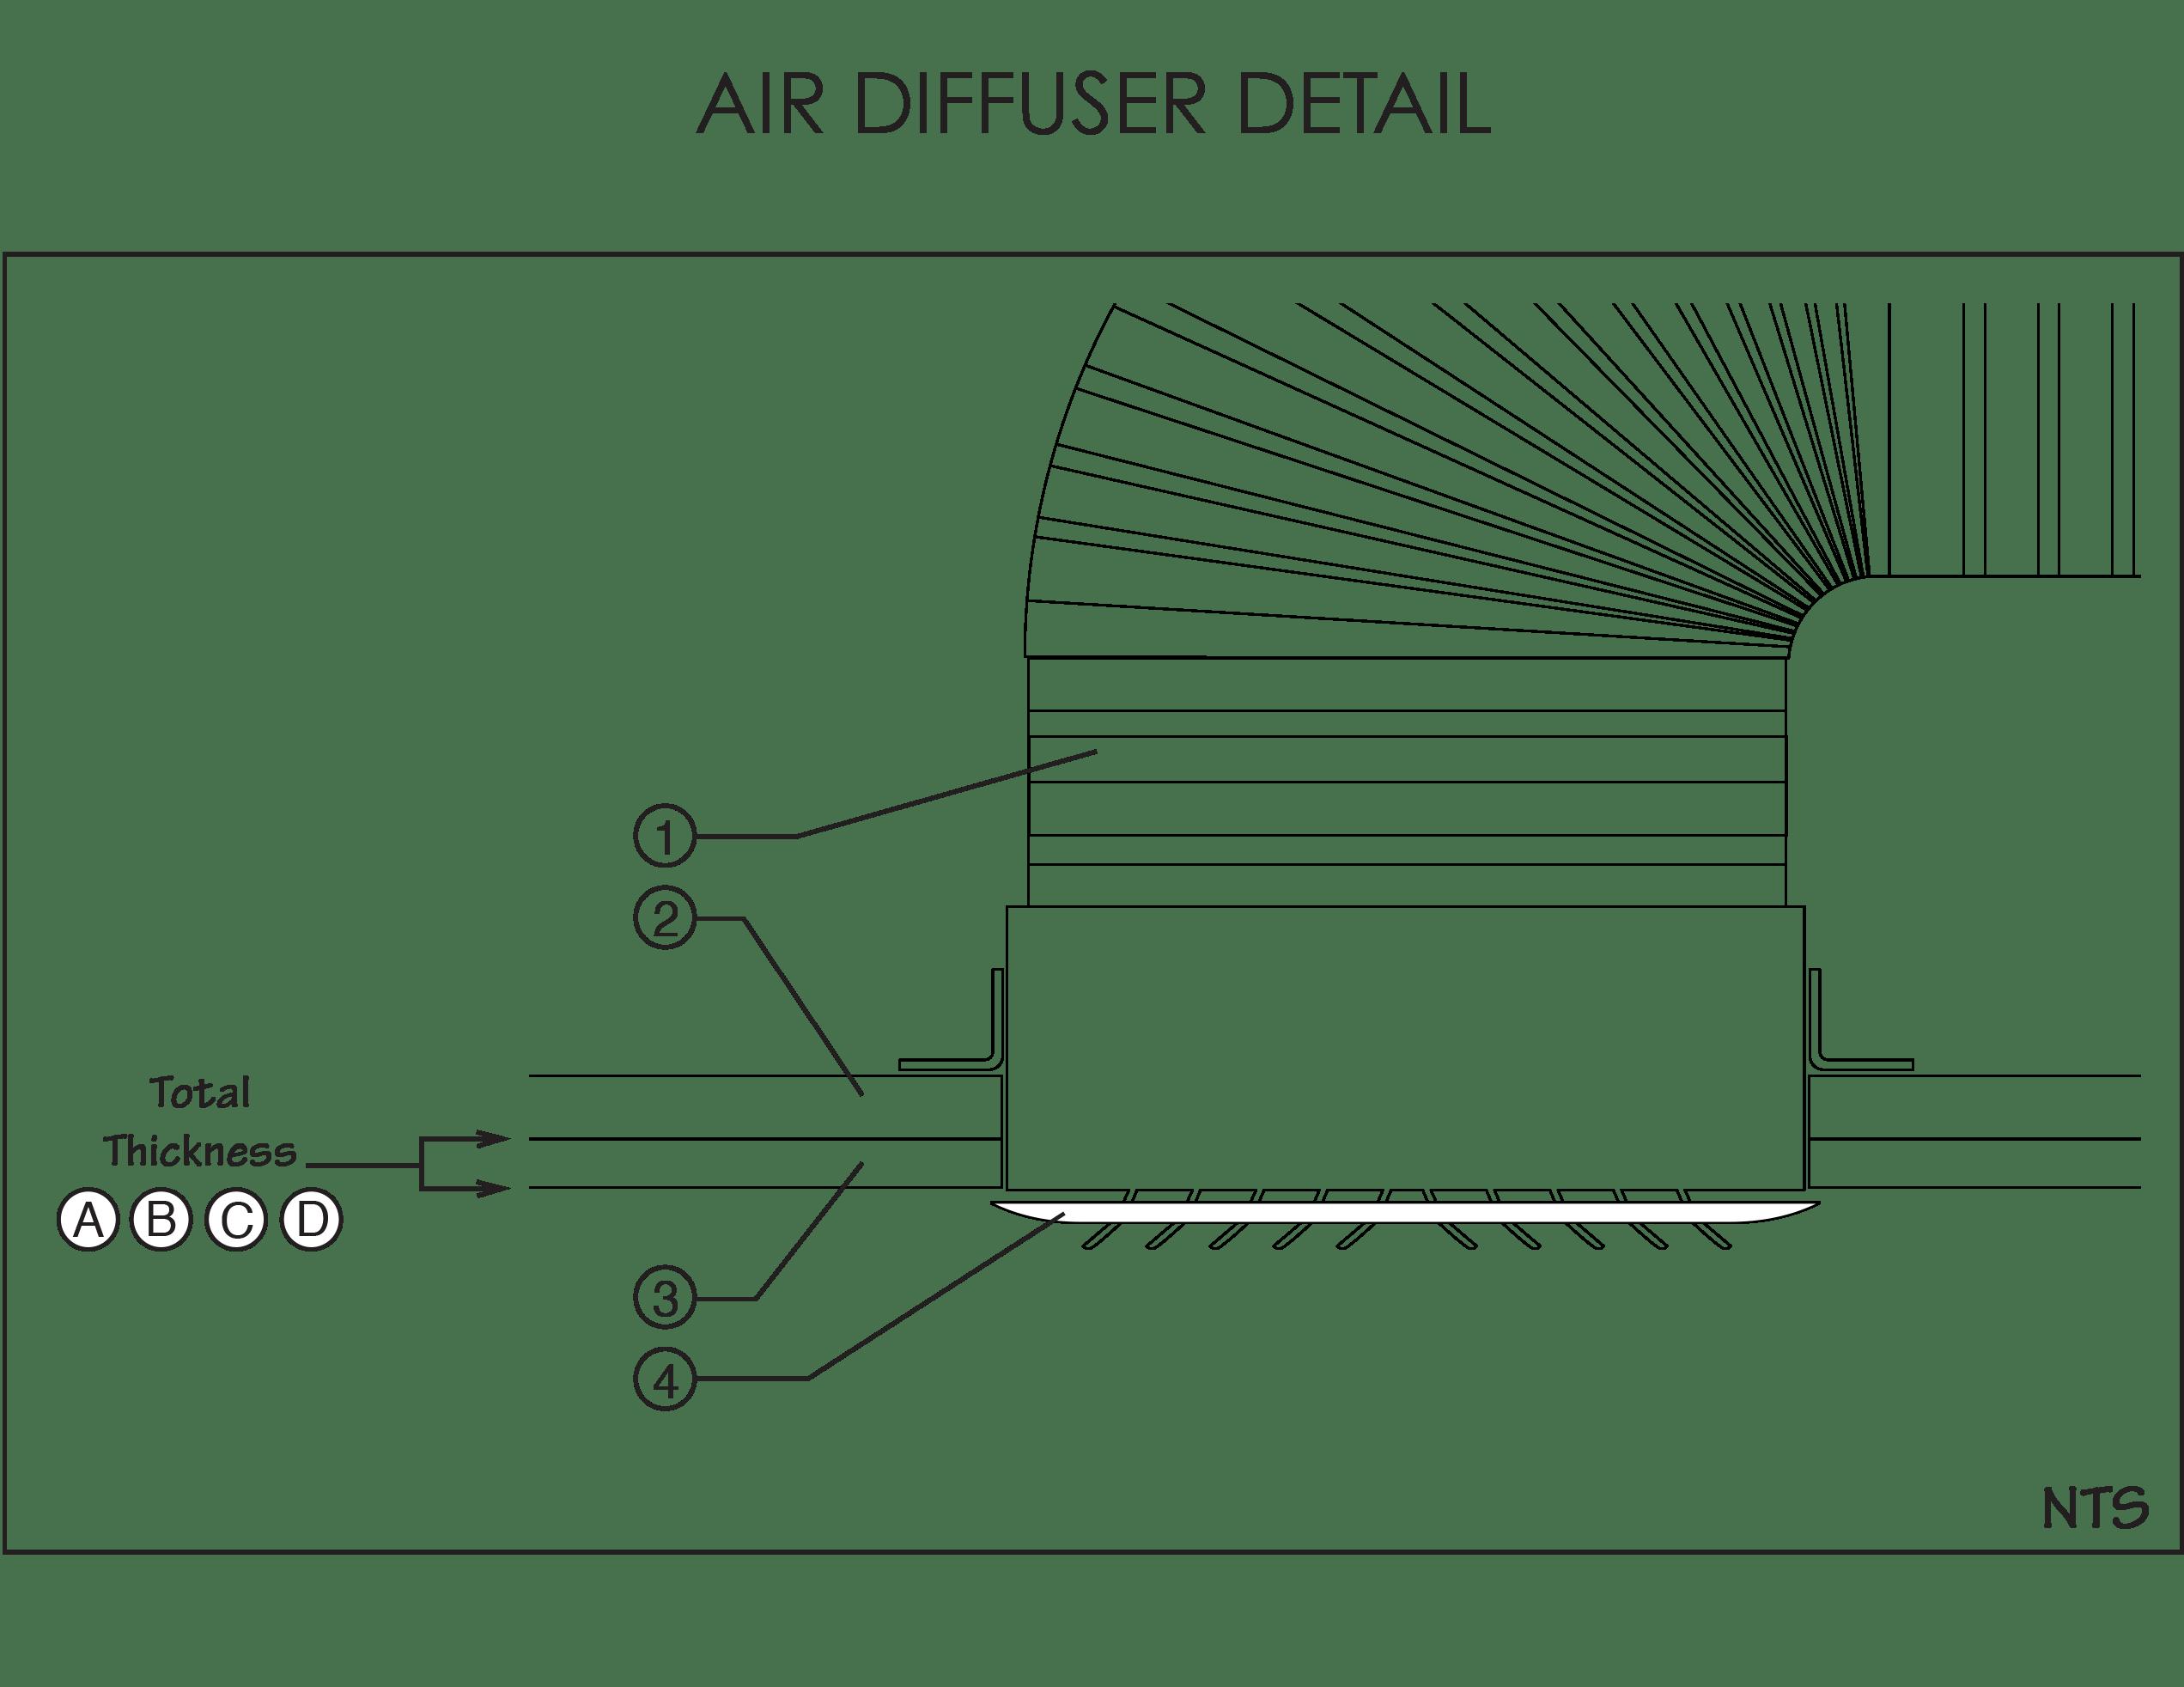 SonaKrete Air Diffuser Detail